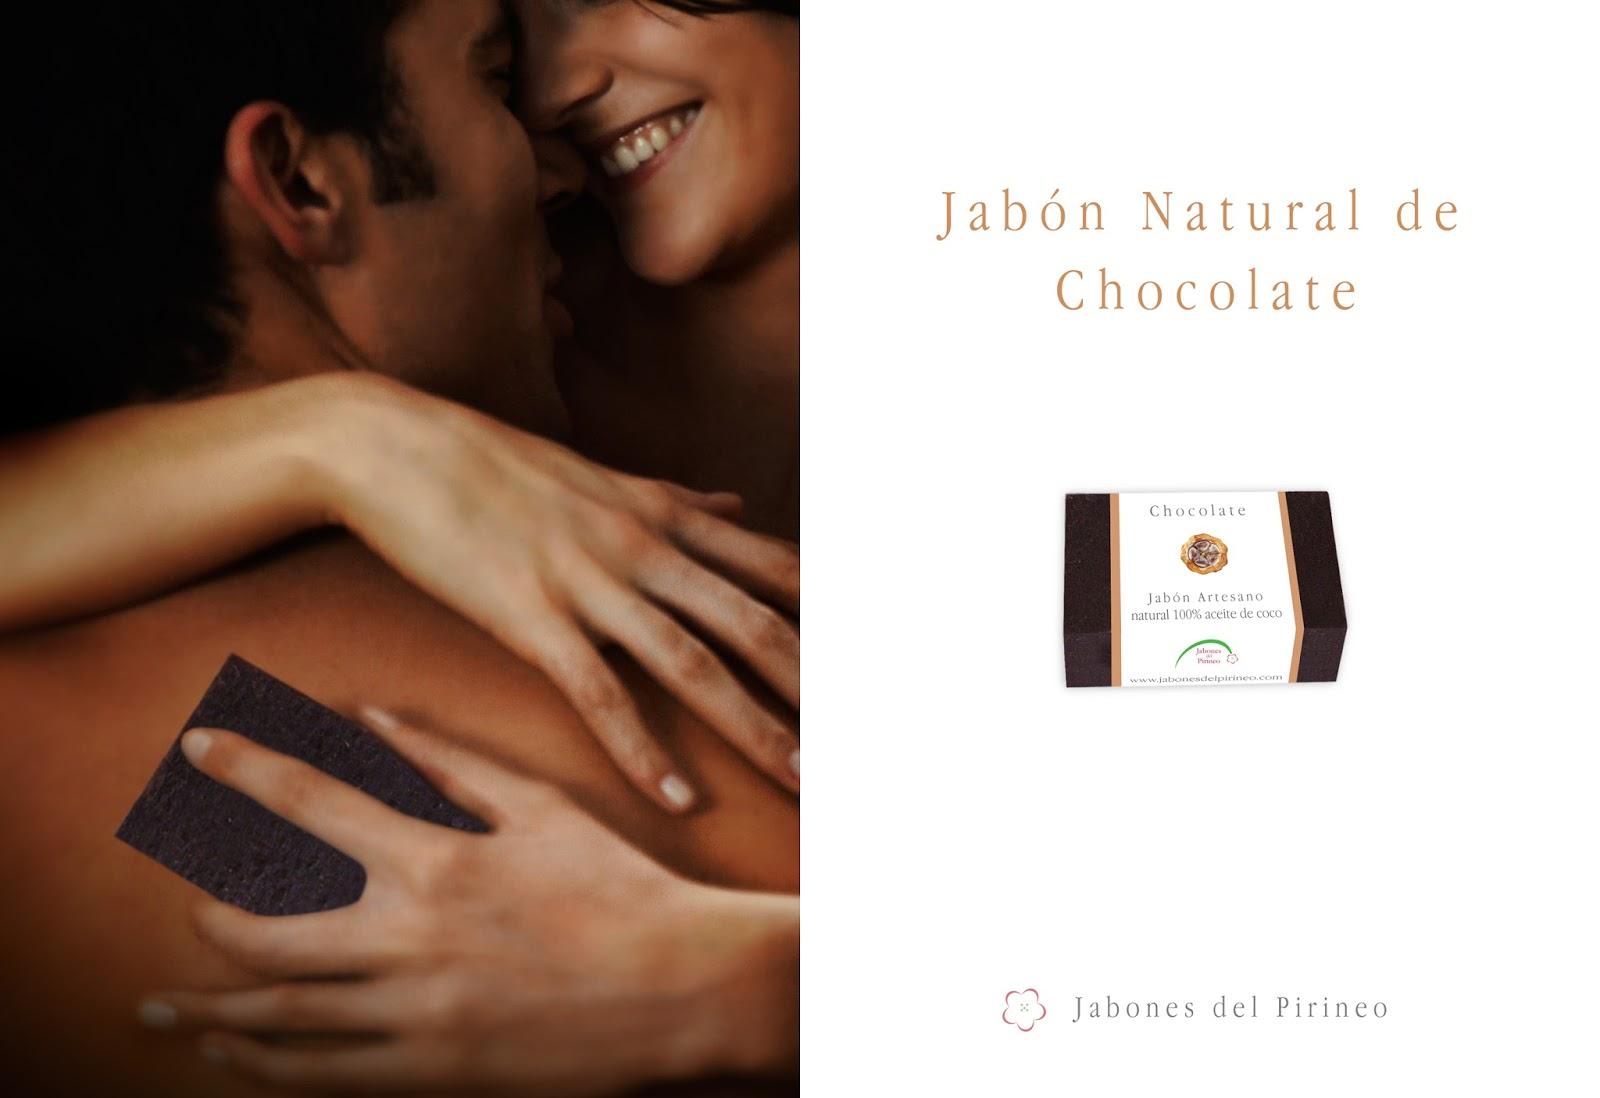 Jabón de Chocolate con Base 100% Aceite de Coco